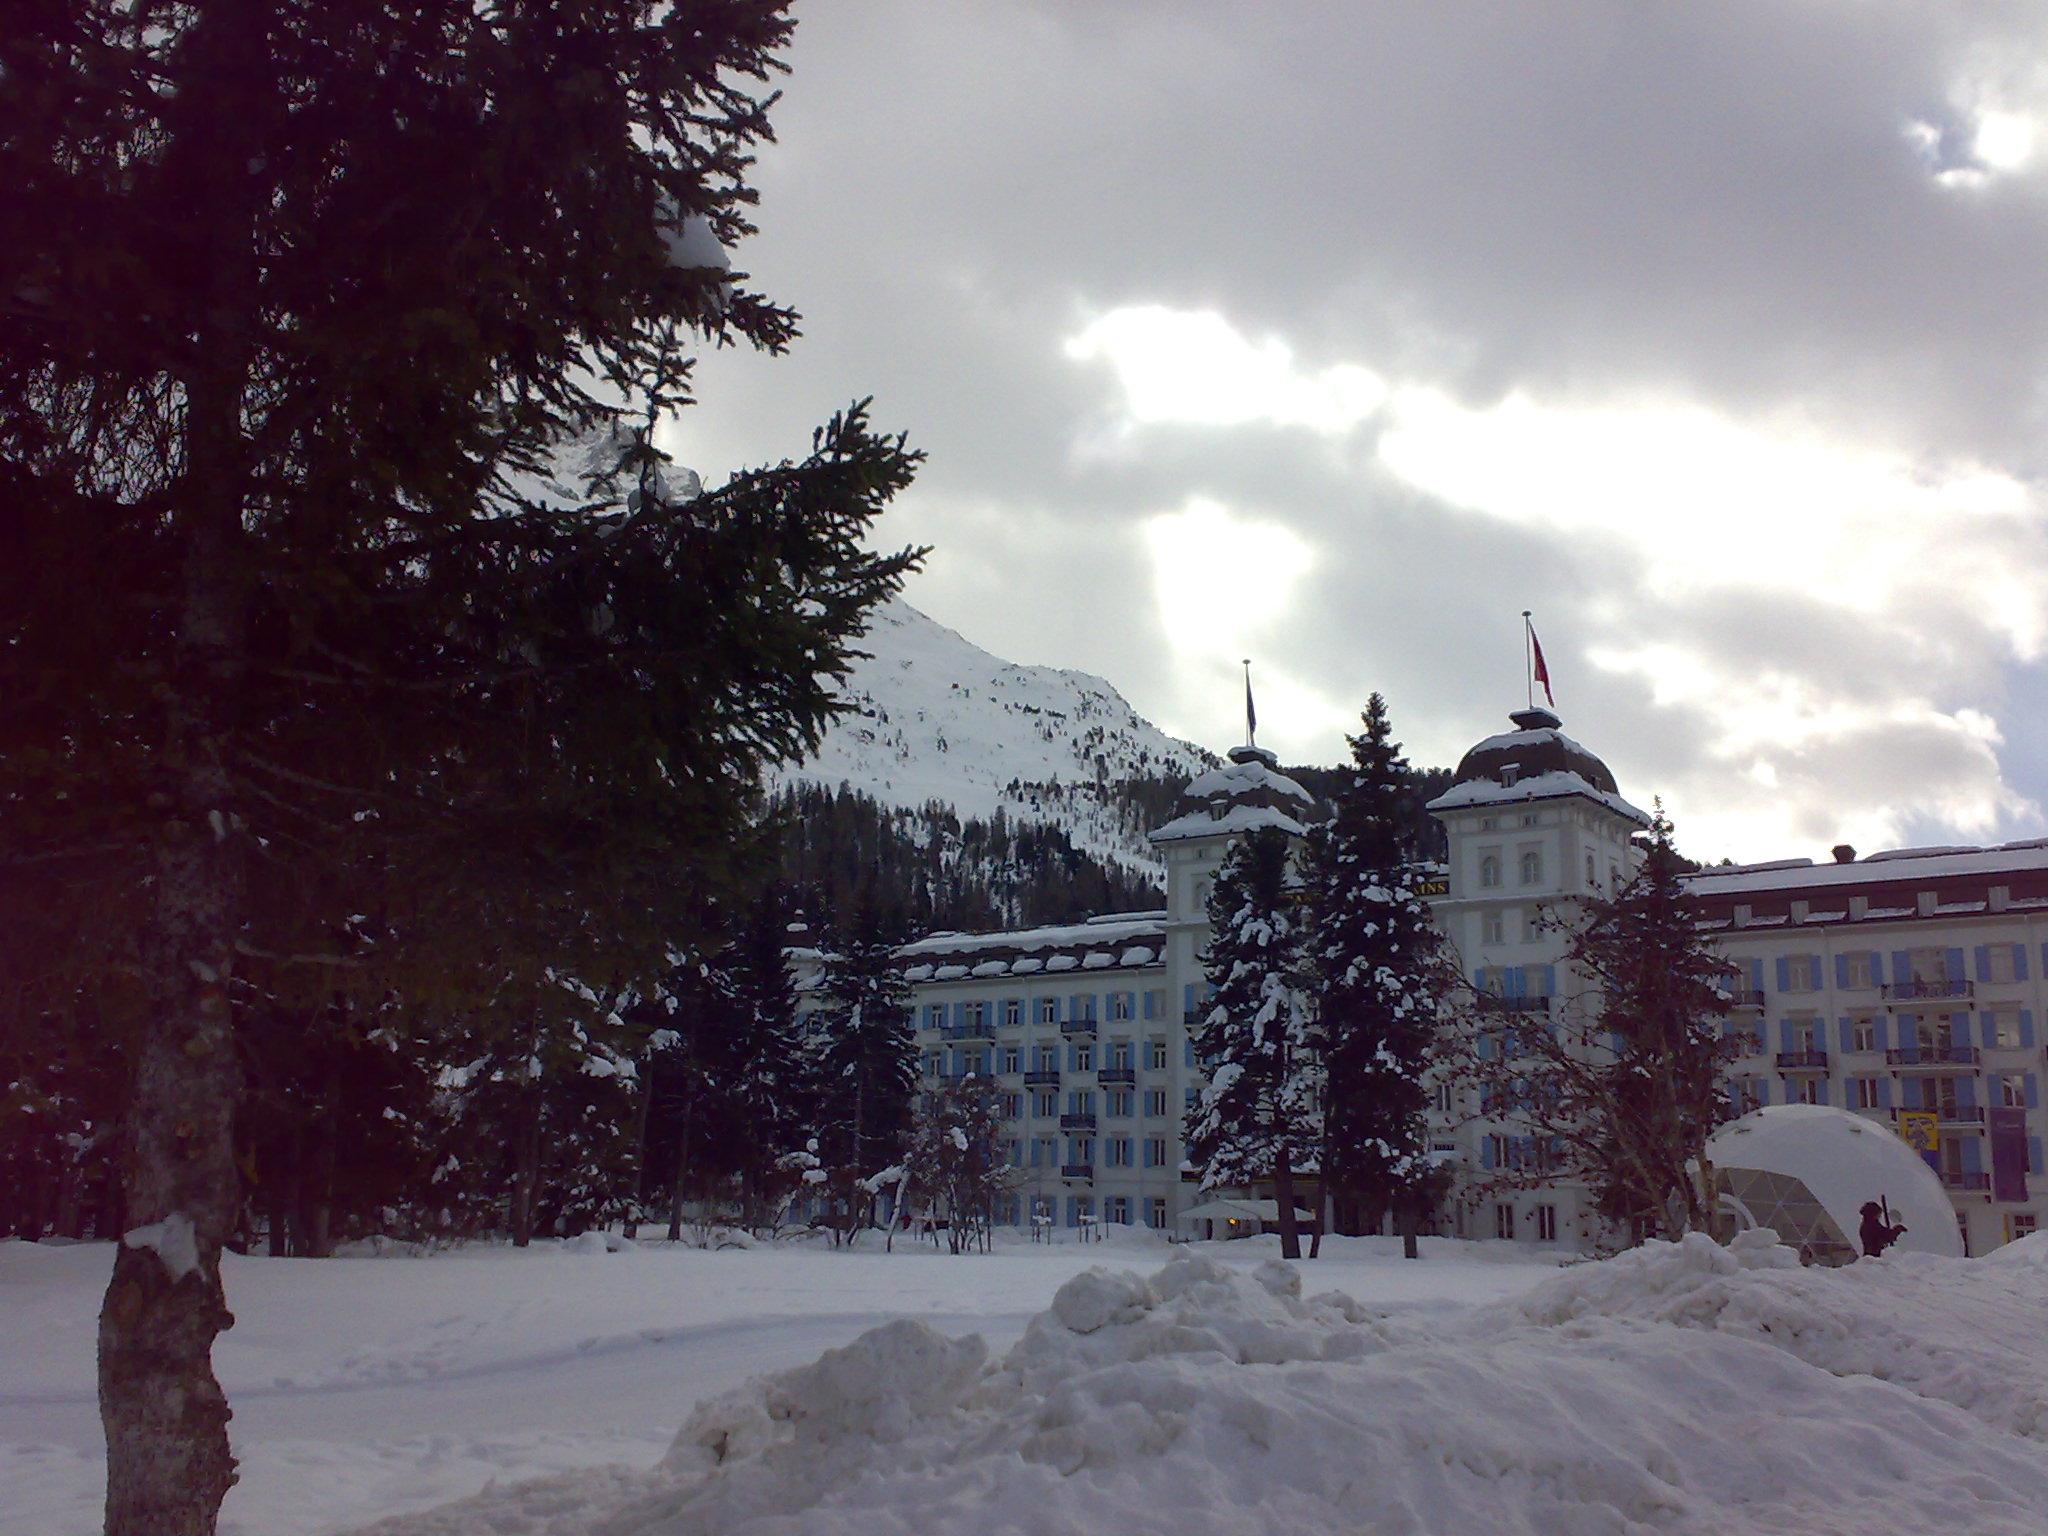 St. Moritz – Kempinski Hotel